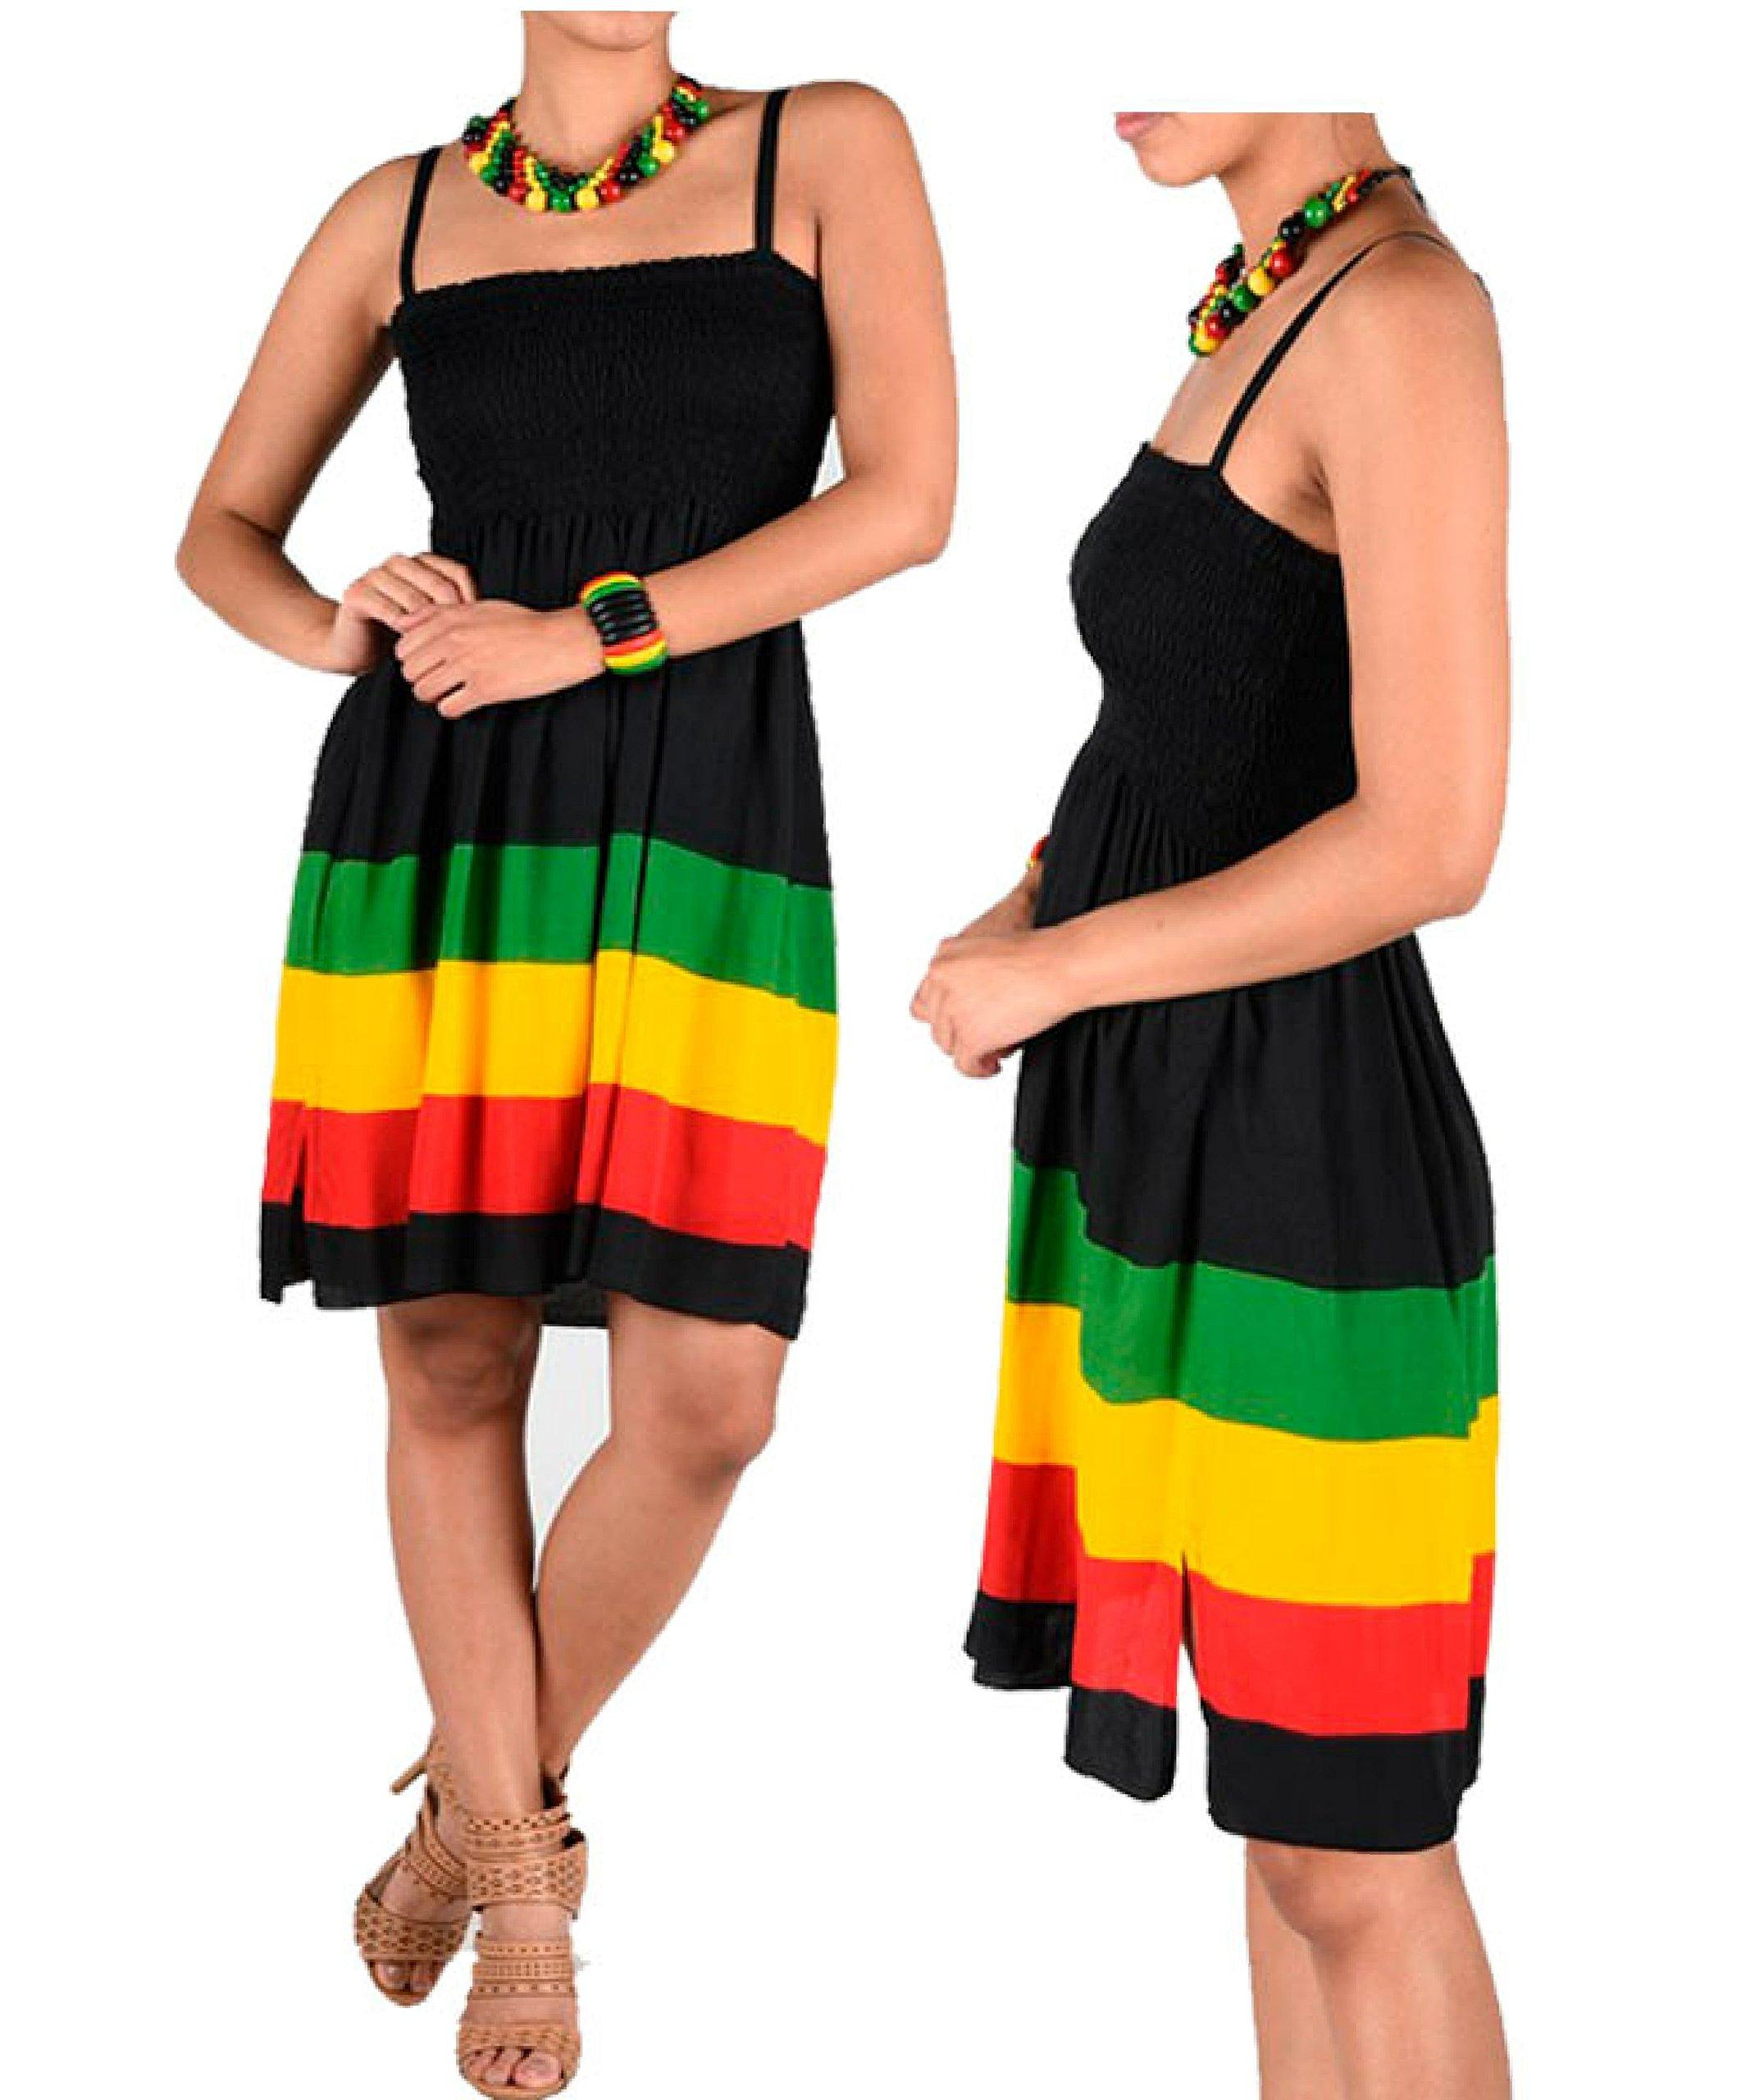 Womens Jamaican Caribbean Reggae Festival Rasta Colored Sleeveless Empire Skirt Dress 1 Size Fit Most Stretch Fit Green, Black